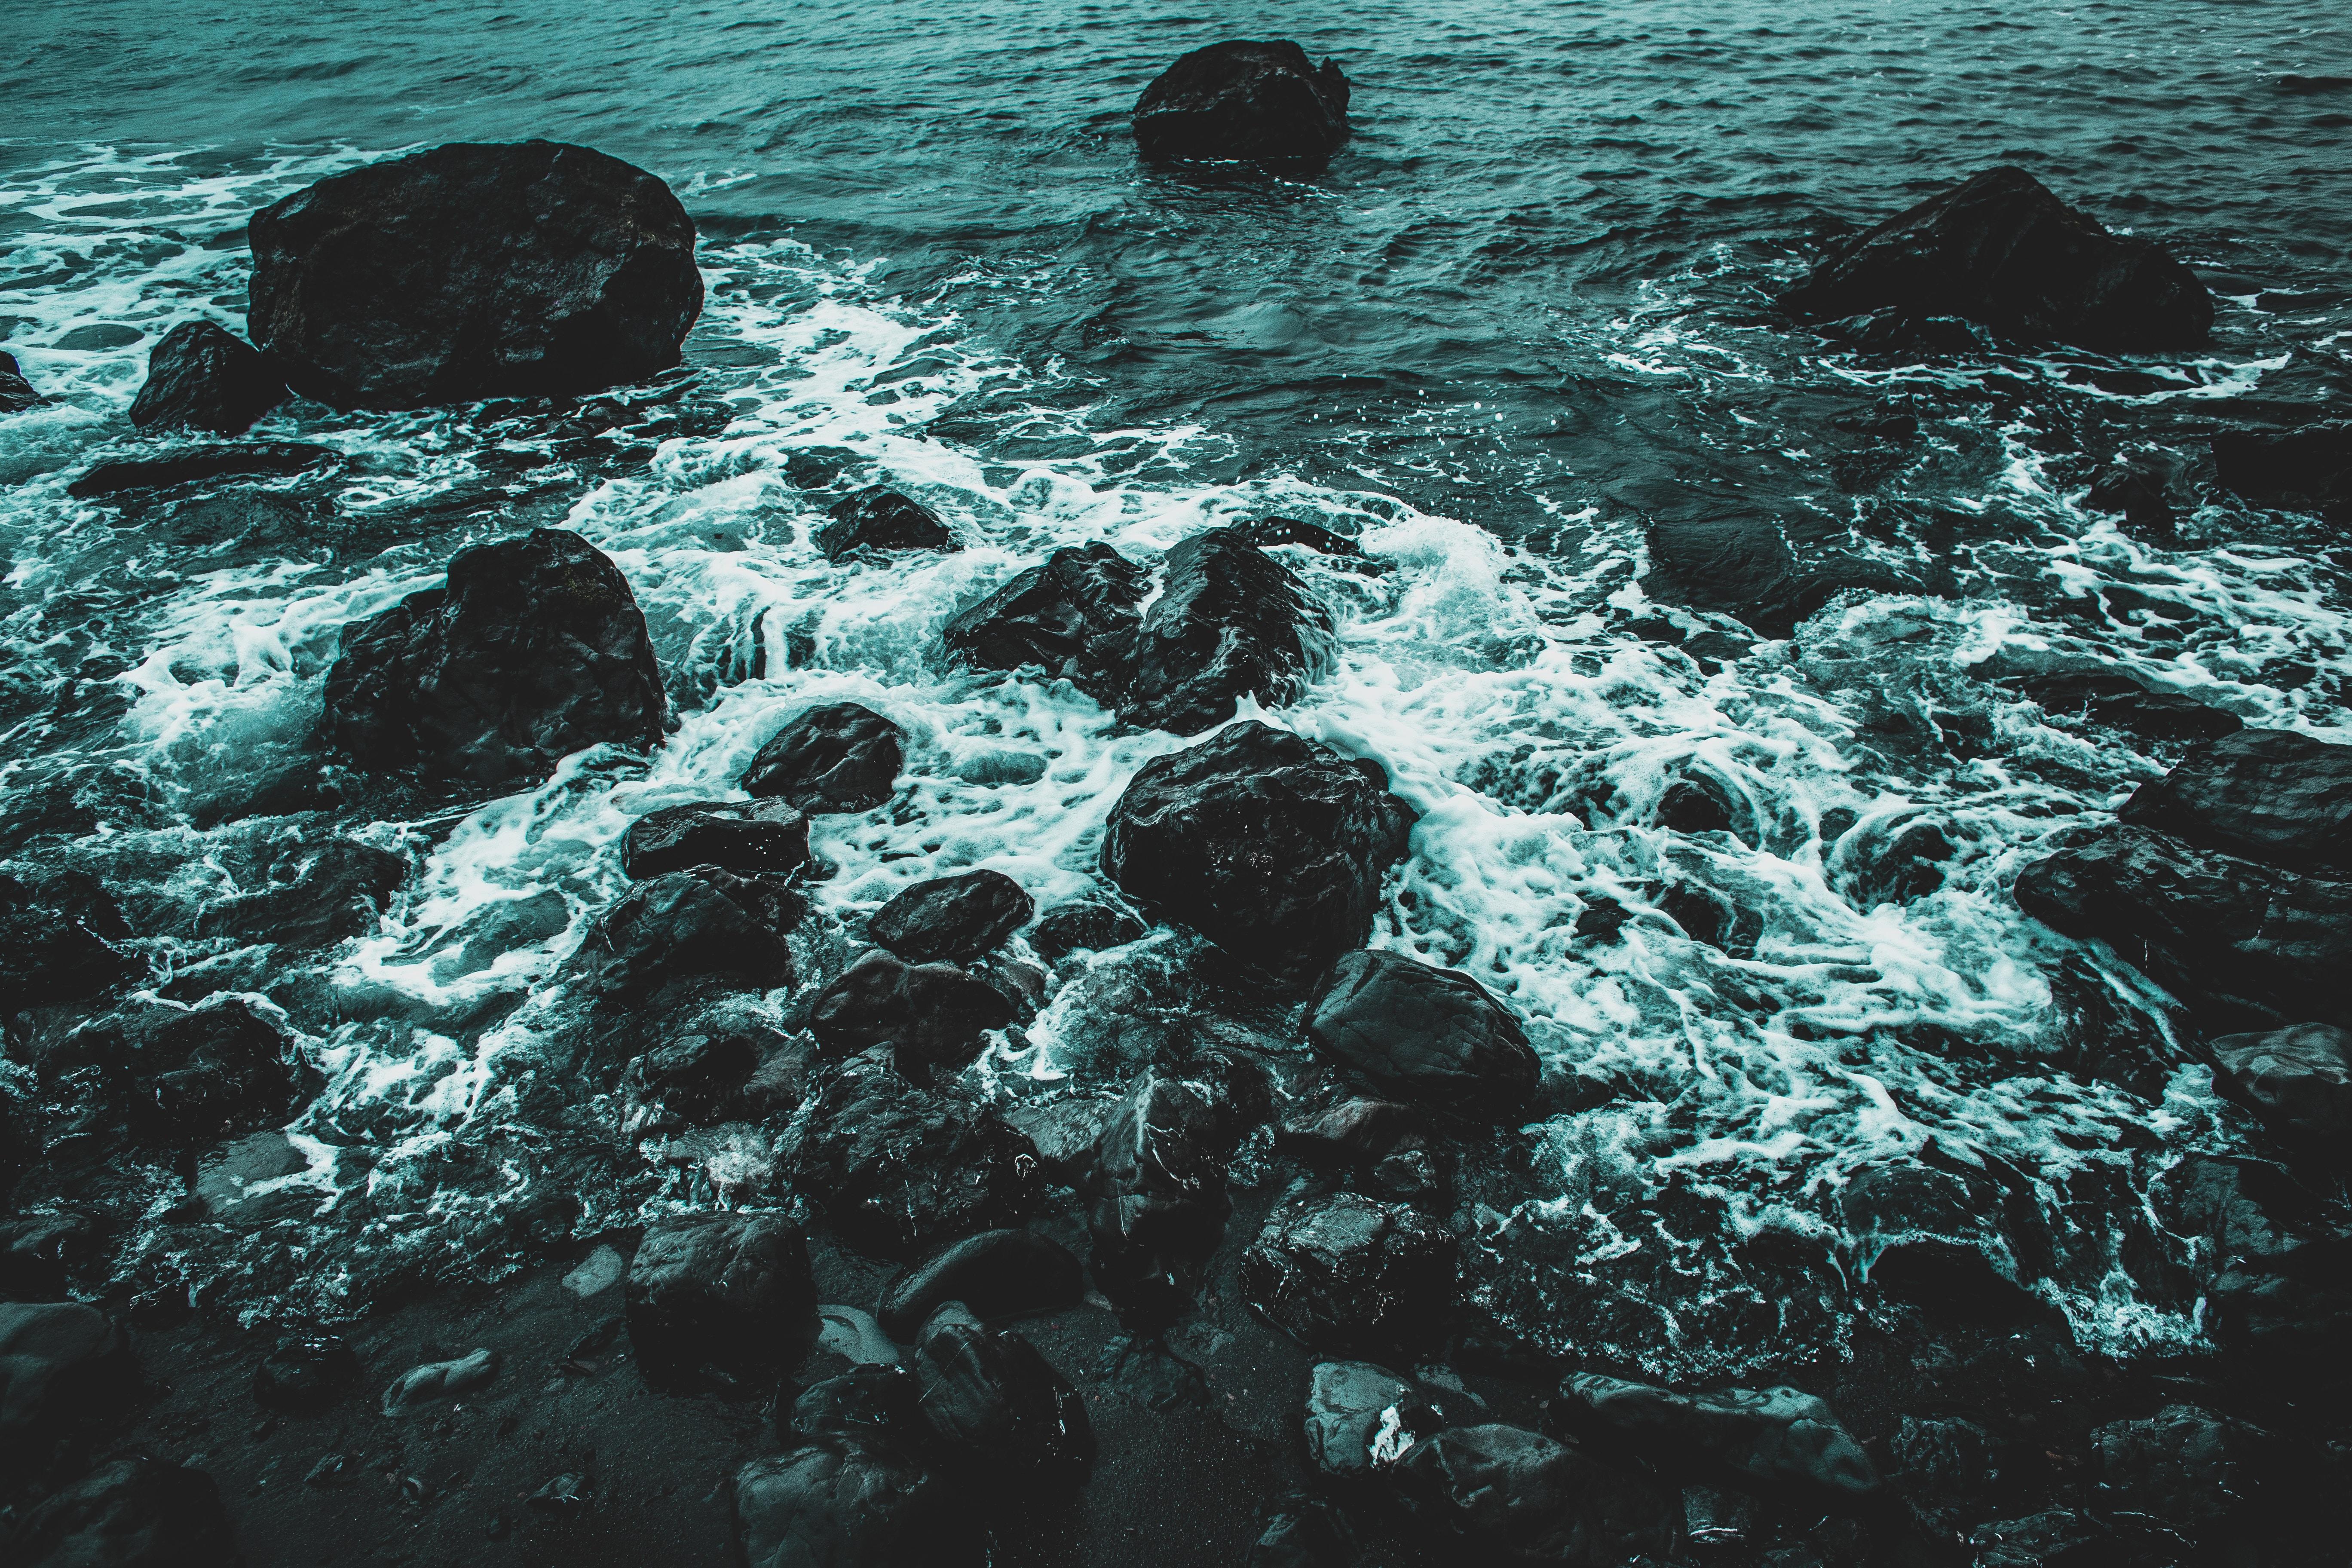 Dark rippling waves hitting into rocks.